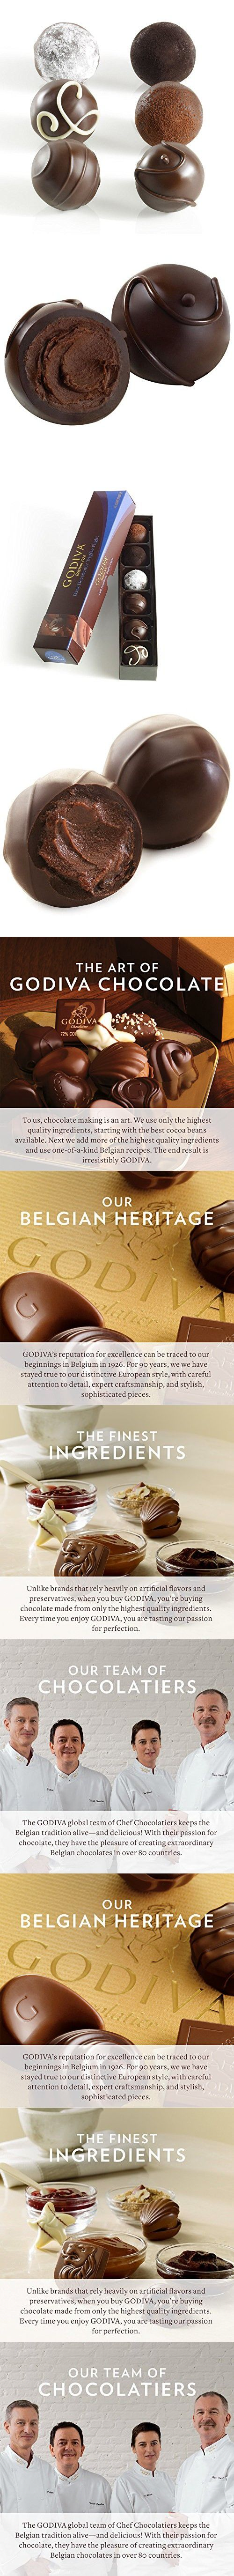 Godiva Chocolatier Flight Chocolate Truffle, Dark Decadence, 6 Count